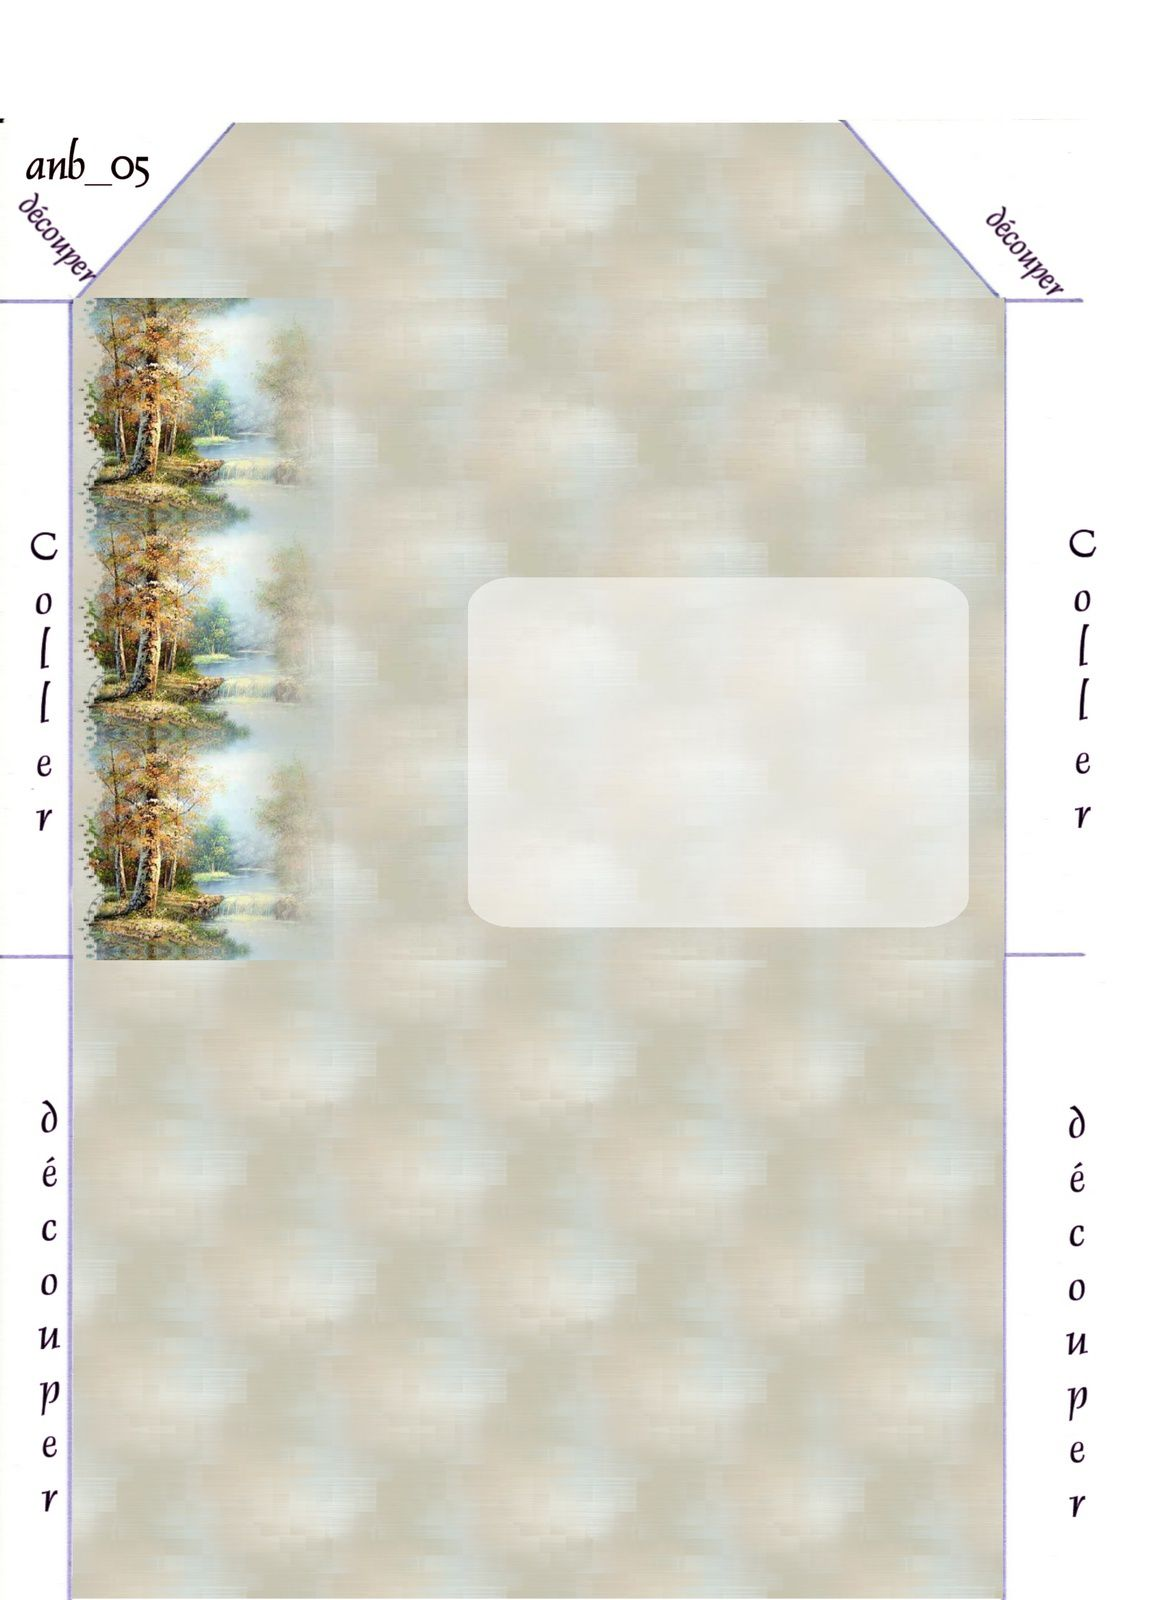 Paysage Incredimail &amp&#x3B; Papier A4 h l &amp&#x3B; outlook &amp&#x3B; enveloppe &amp&#x3B; 2 cartes A5 &amp&#x3B; signets 3 langues   pays_10602016